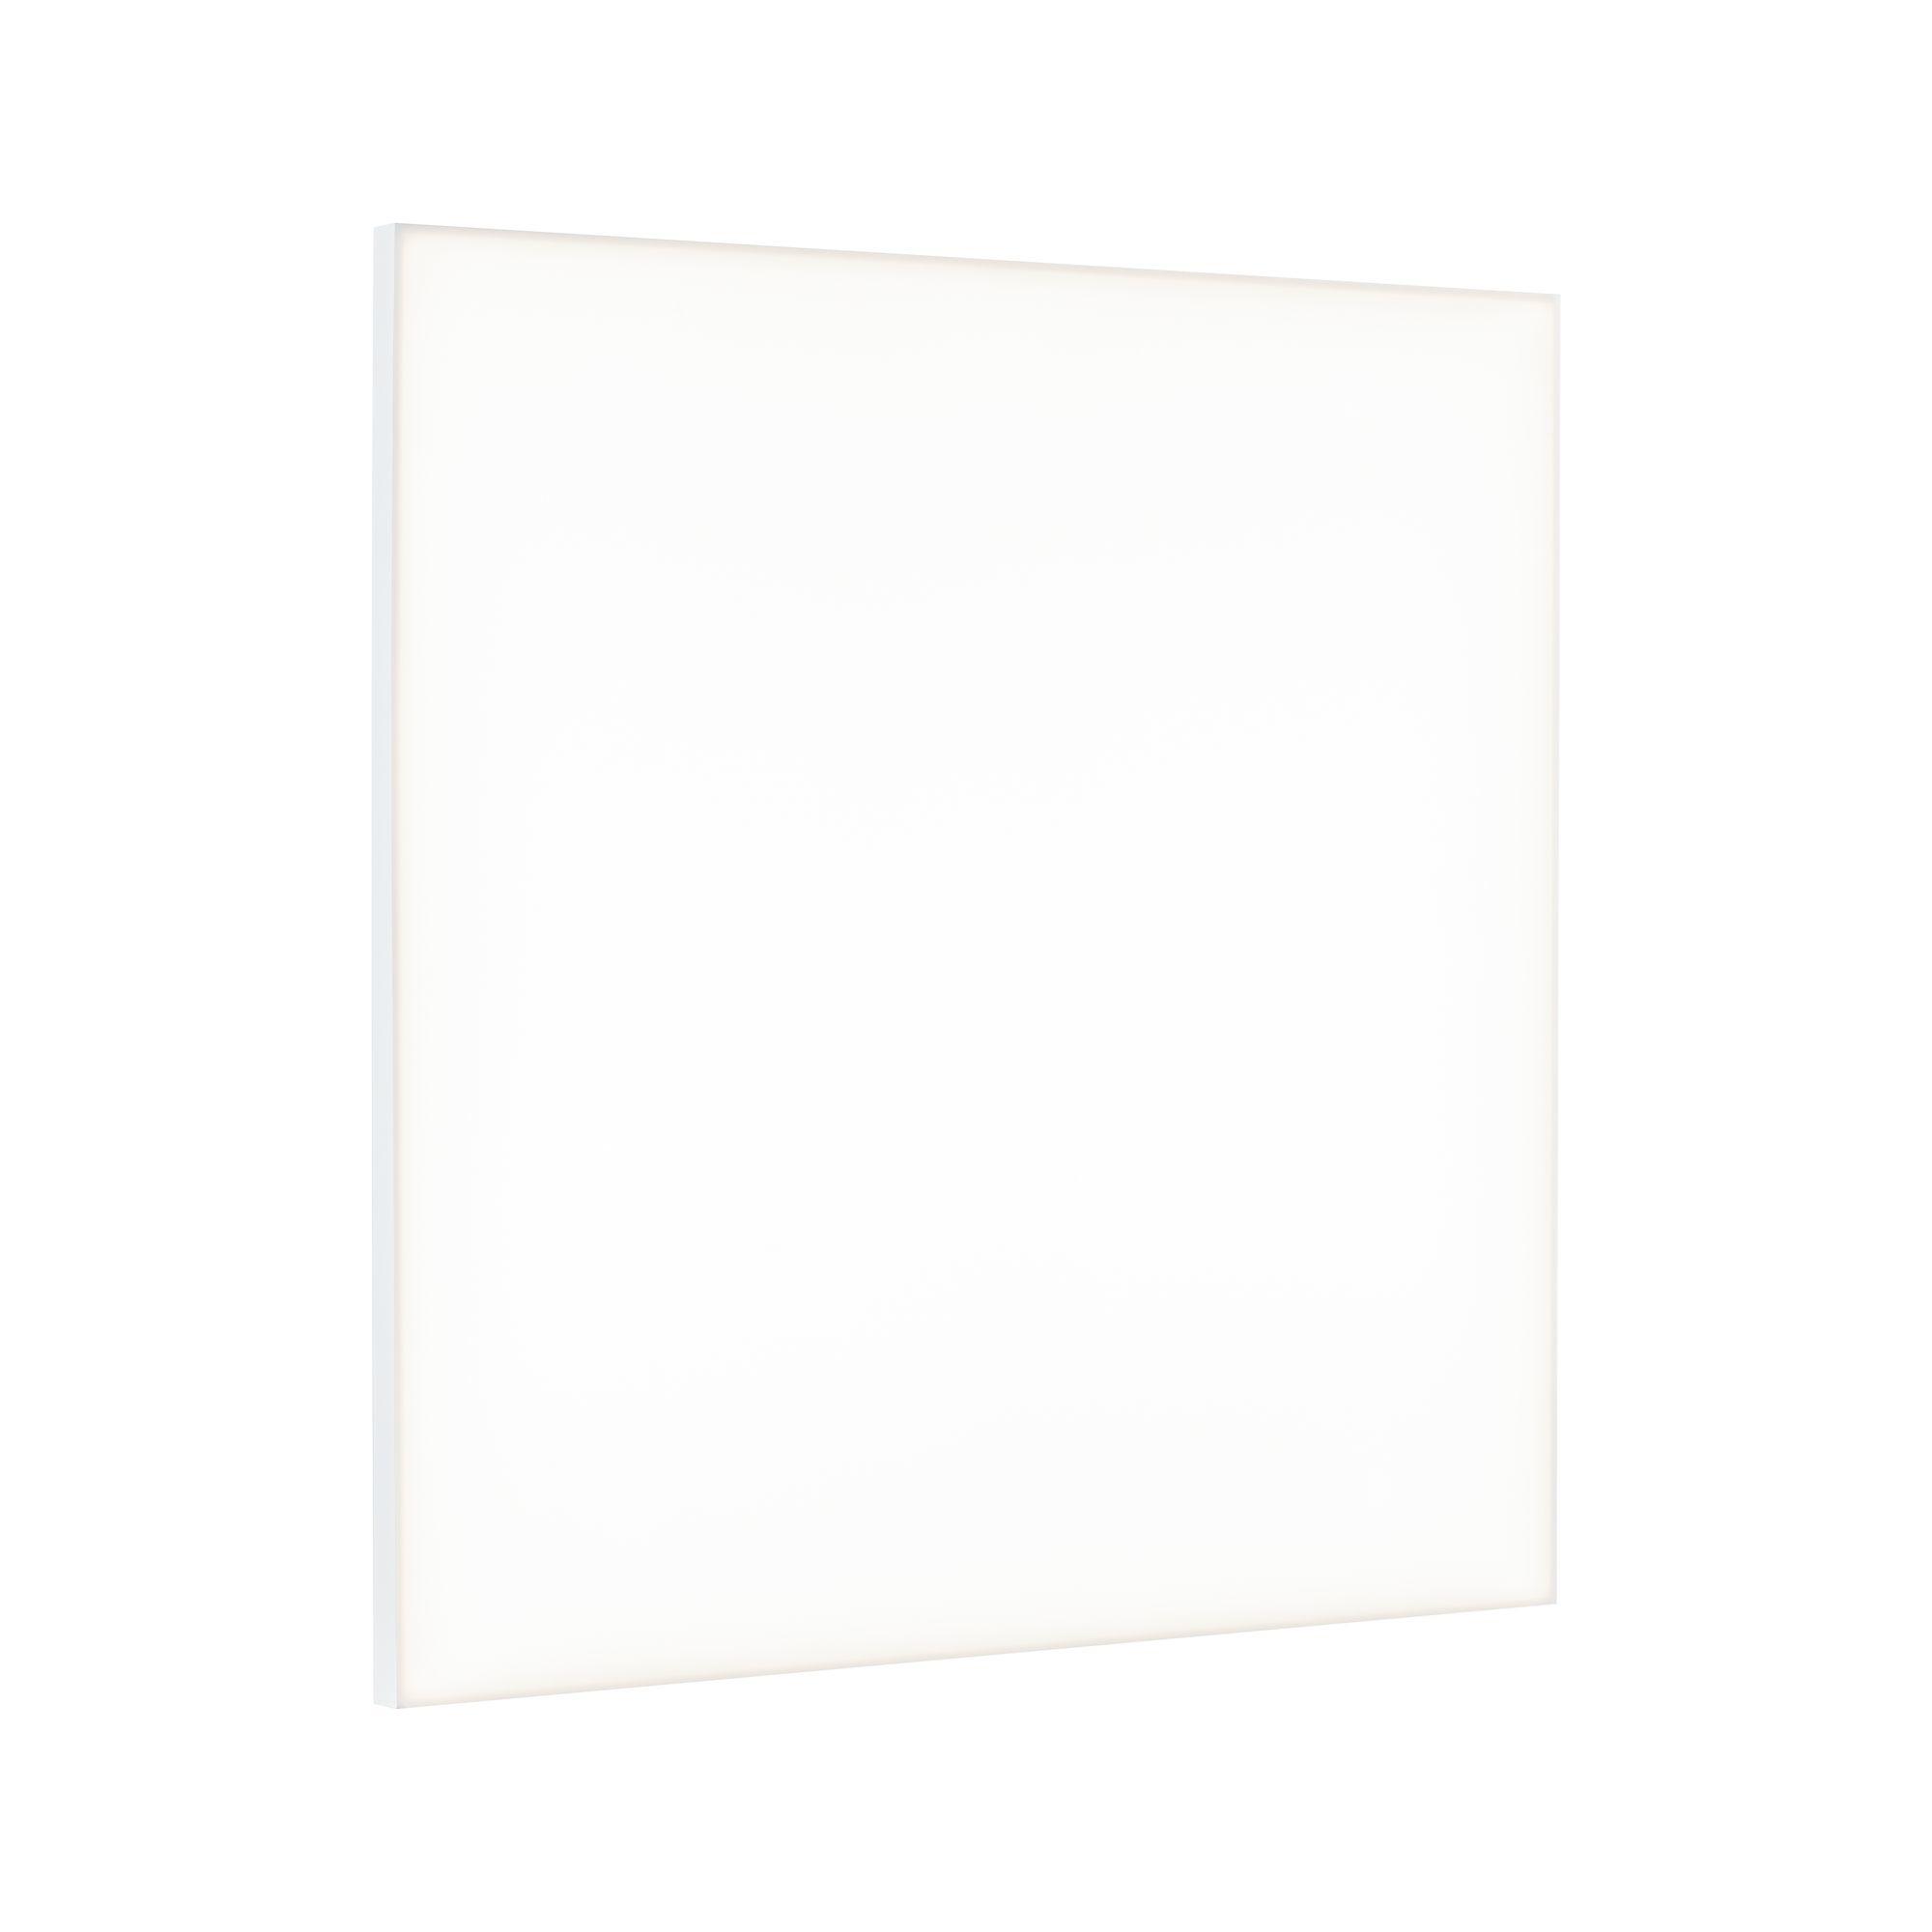 Paulmann WallCeiling Velora LED Panel 595x595mm 34W Weiß matt 230V Metall